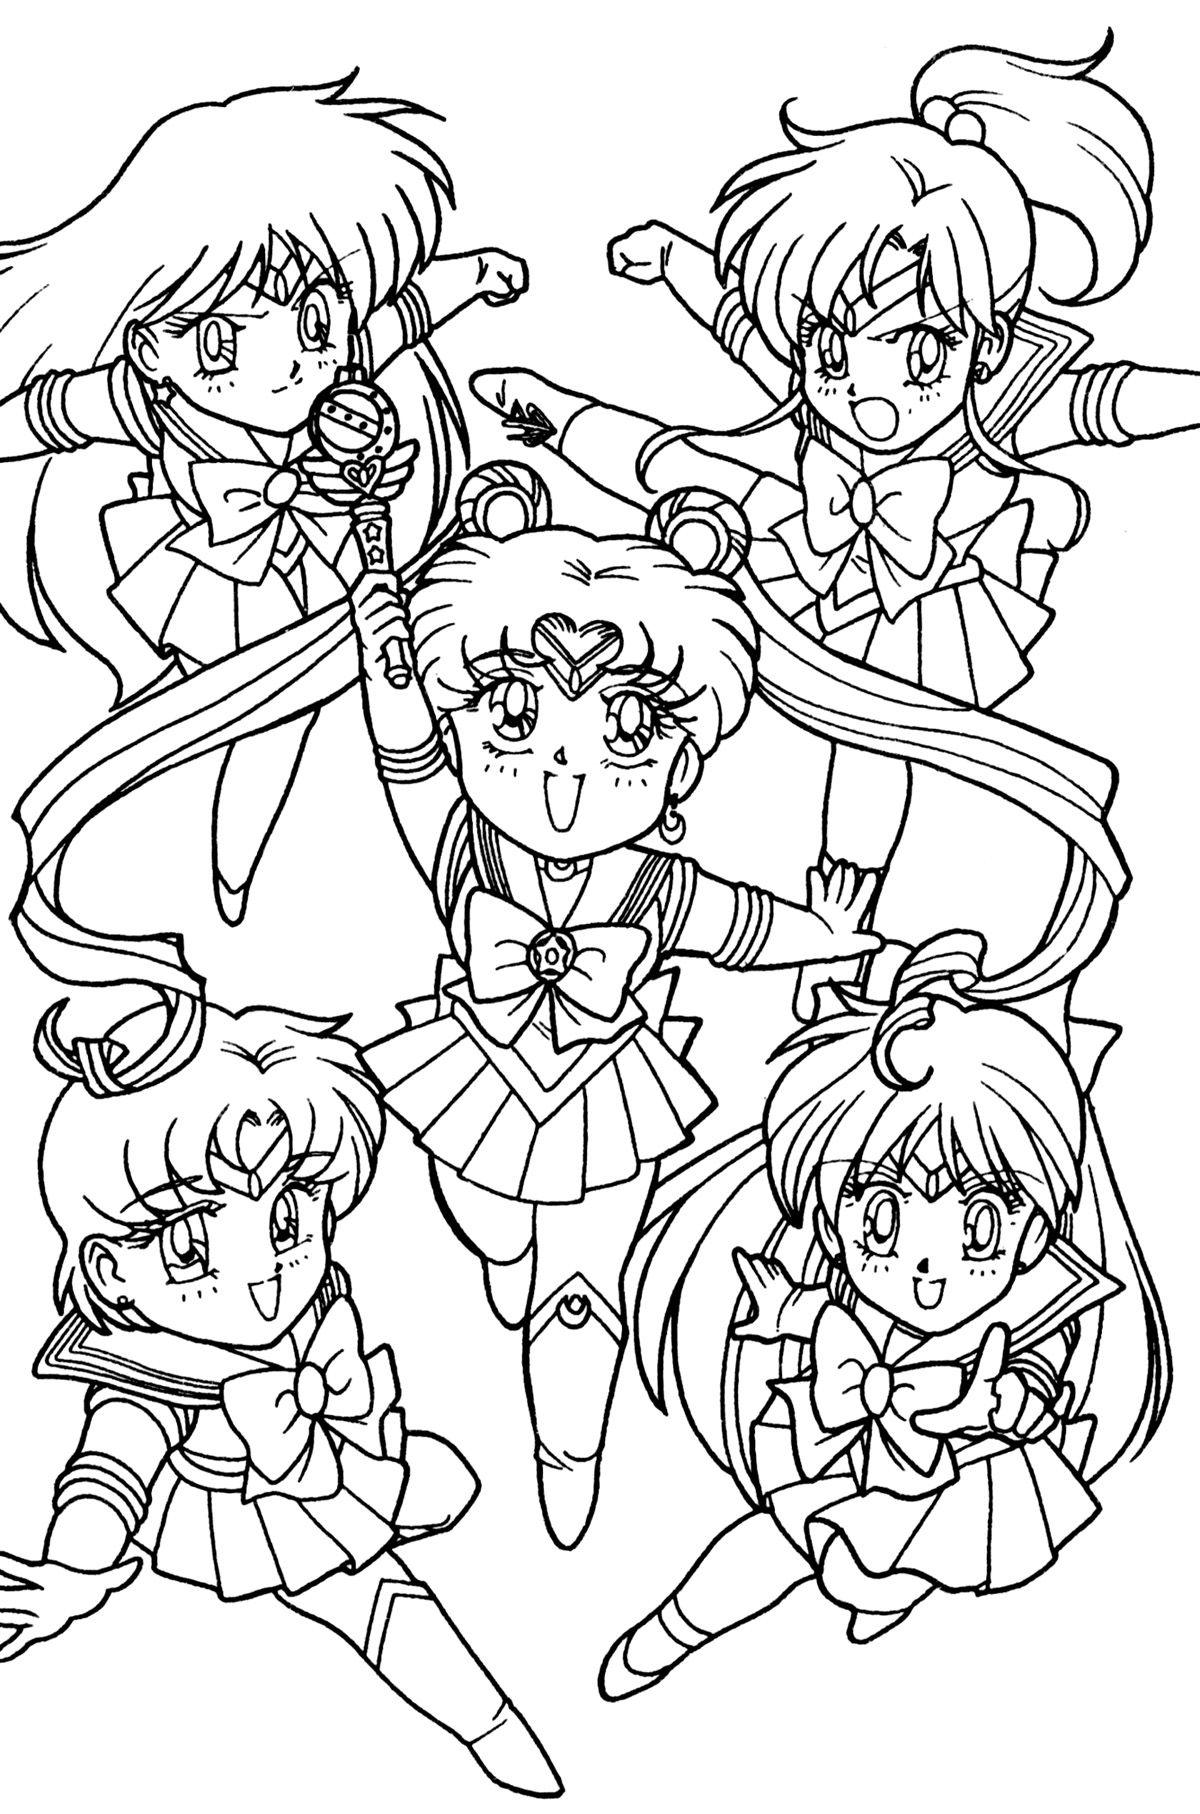 Sailor Chibi Sailor Moon Coloring Pages Sailor Moon Wallpaper Sailor Moon Character